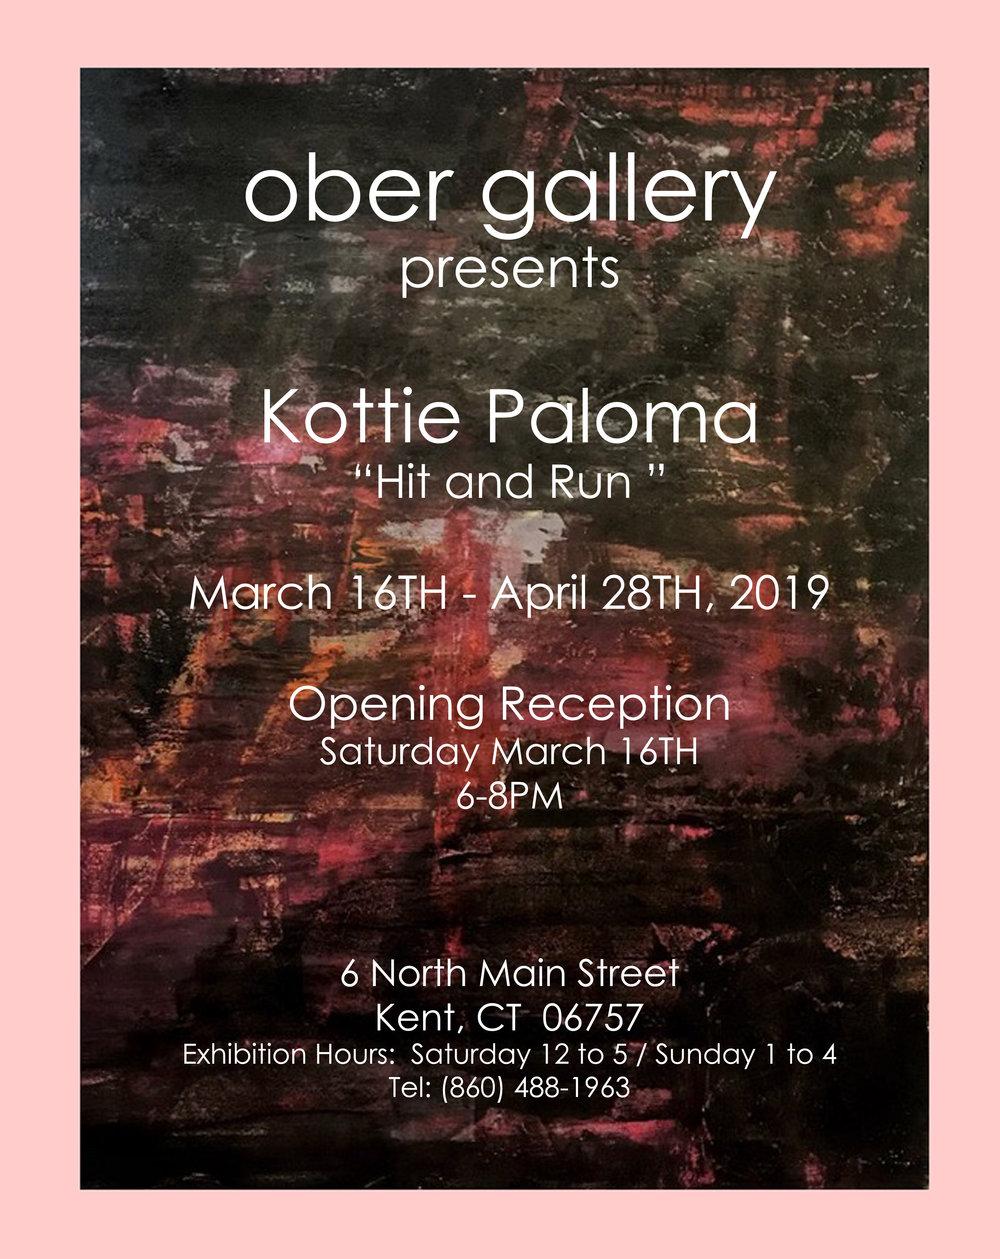 Kottie Hit and Run Ober Gallery.jpg